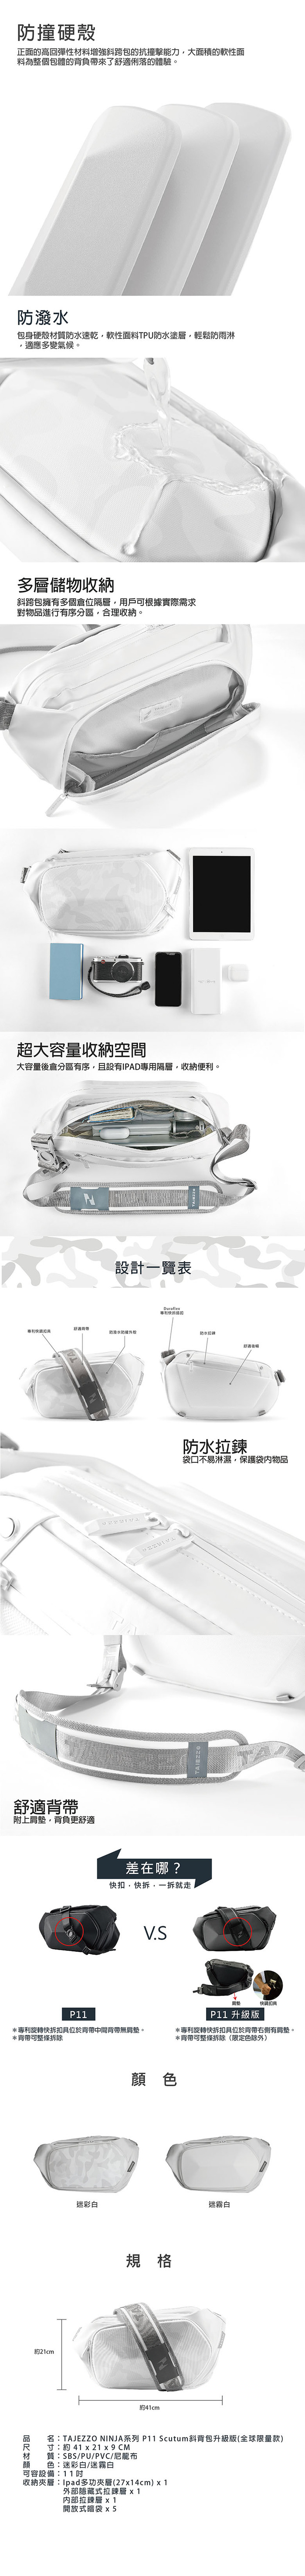 TAJEZZO|P11 Scutum斜背包升級版(全球限量款)